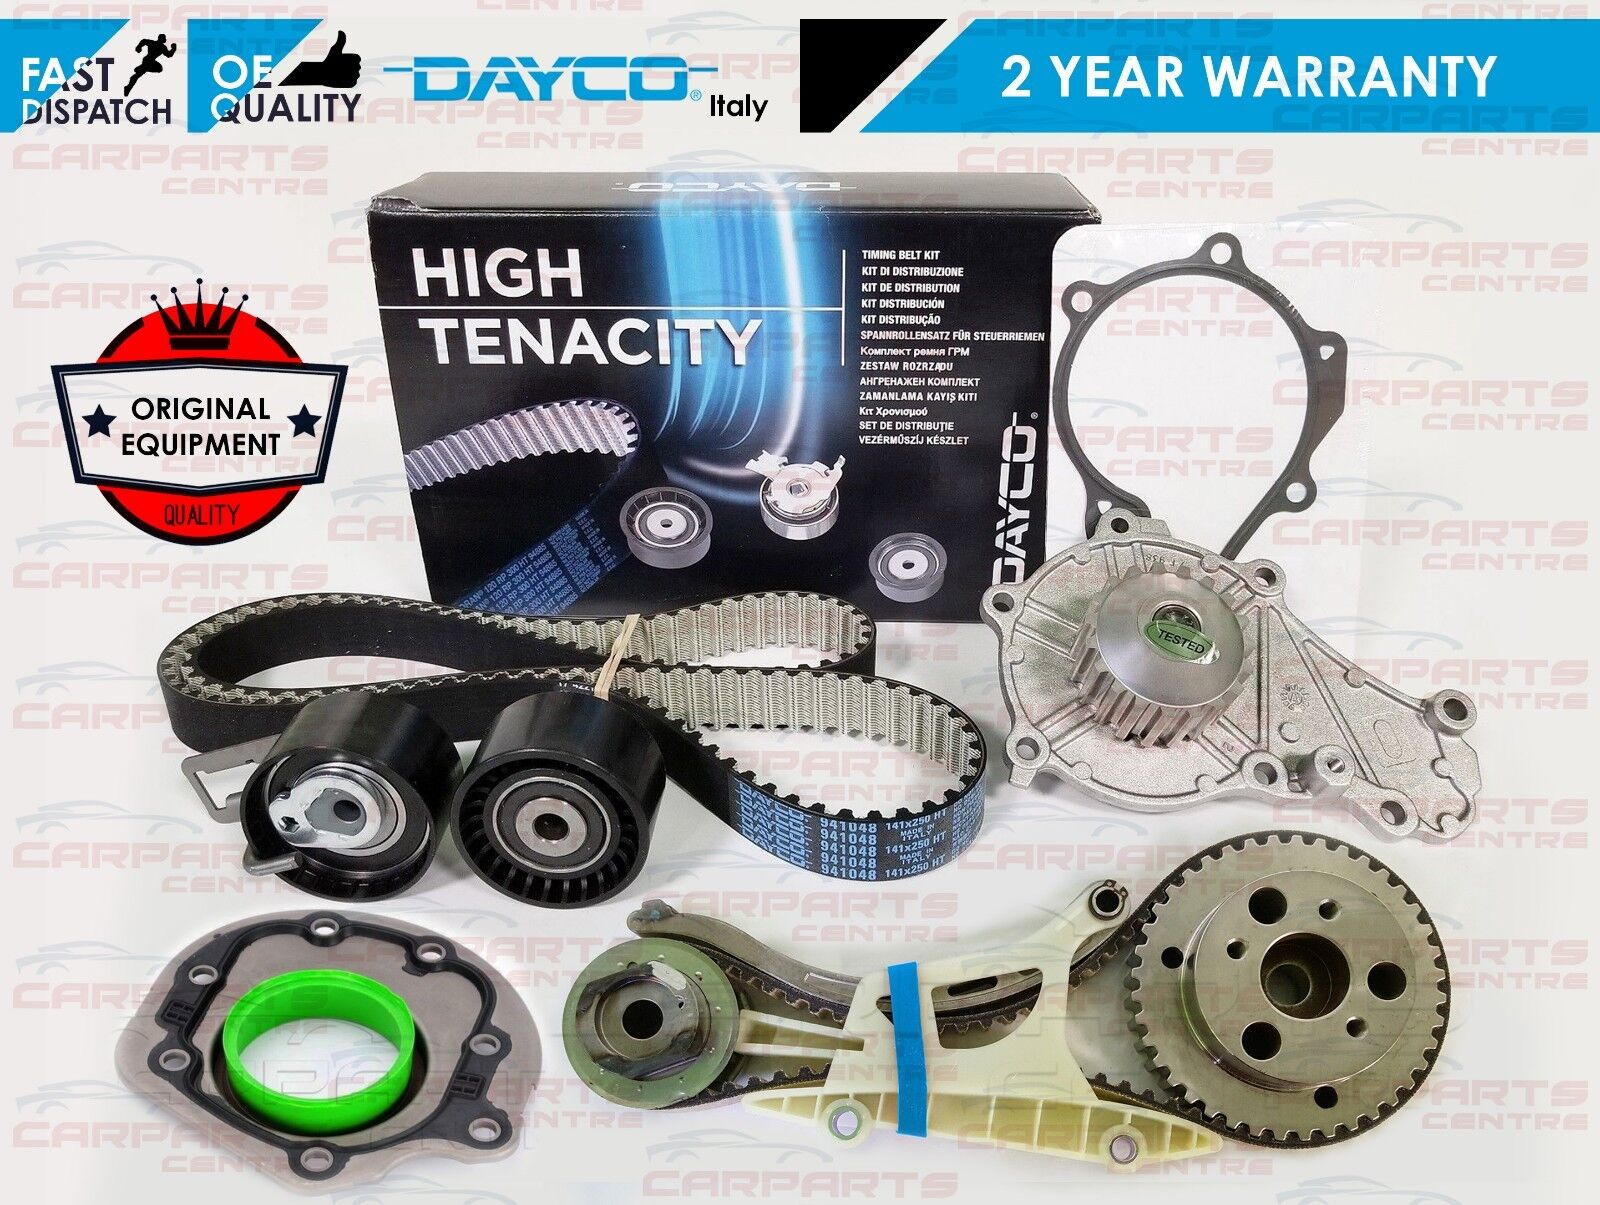 Dayco Cinghia di DISTRIBUZIONE KTB470 Si Adatta Ford C-MAX 1.8 TDCI 2007 - OE Quality parte